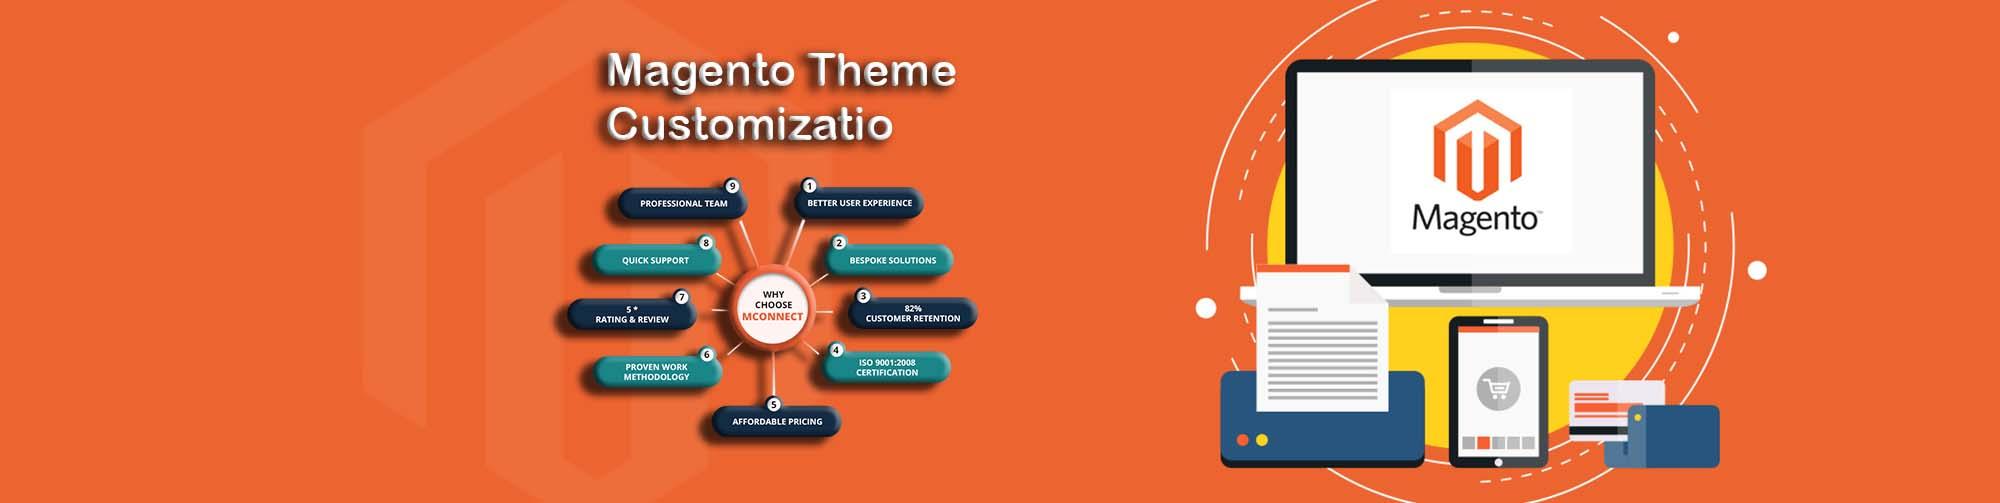 Magento Theme Customization